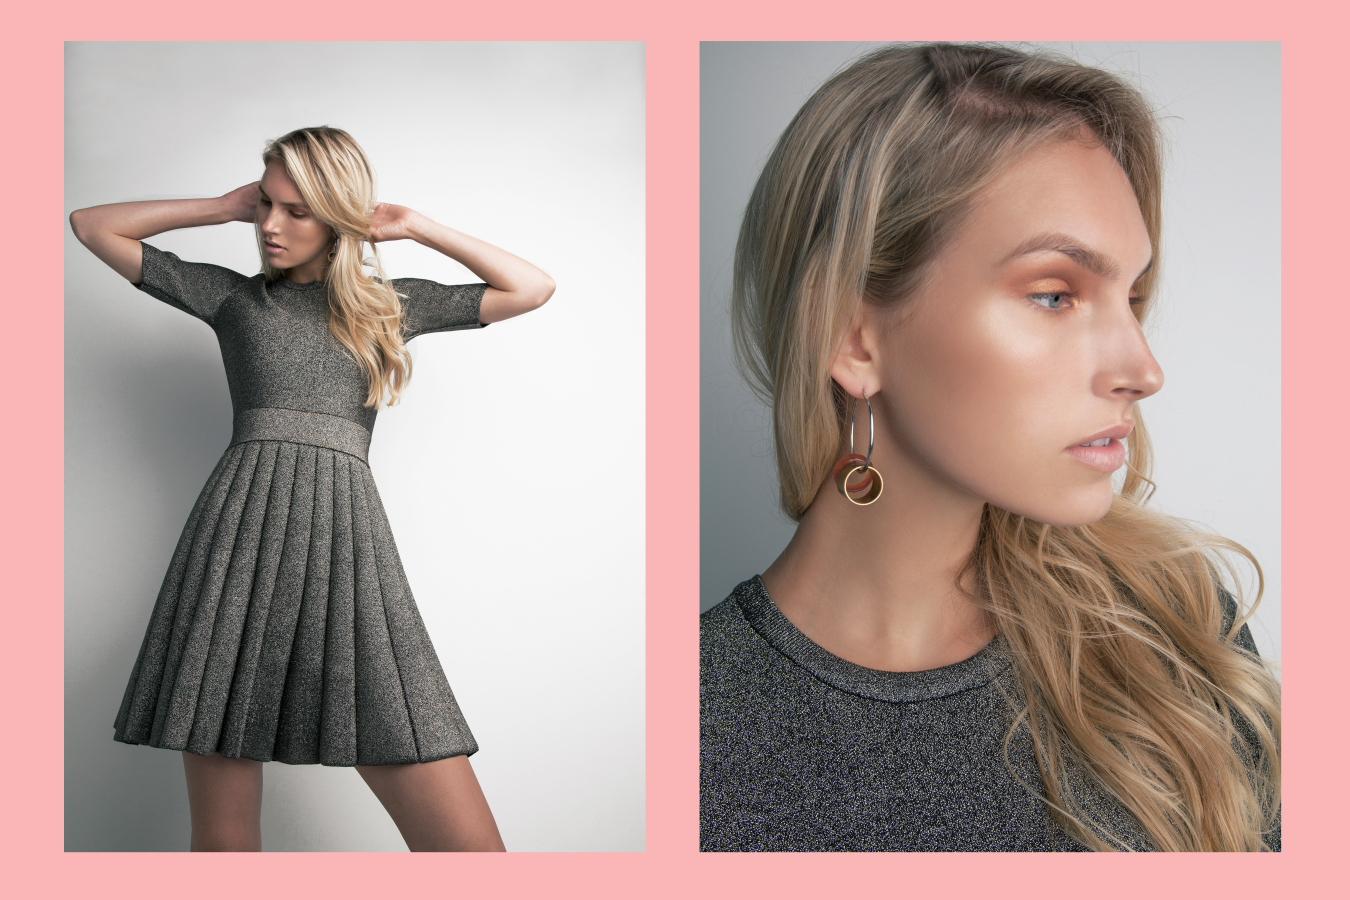 A.L.C Susanna A-line dress, Double Disco earrings